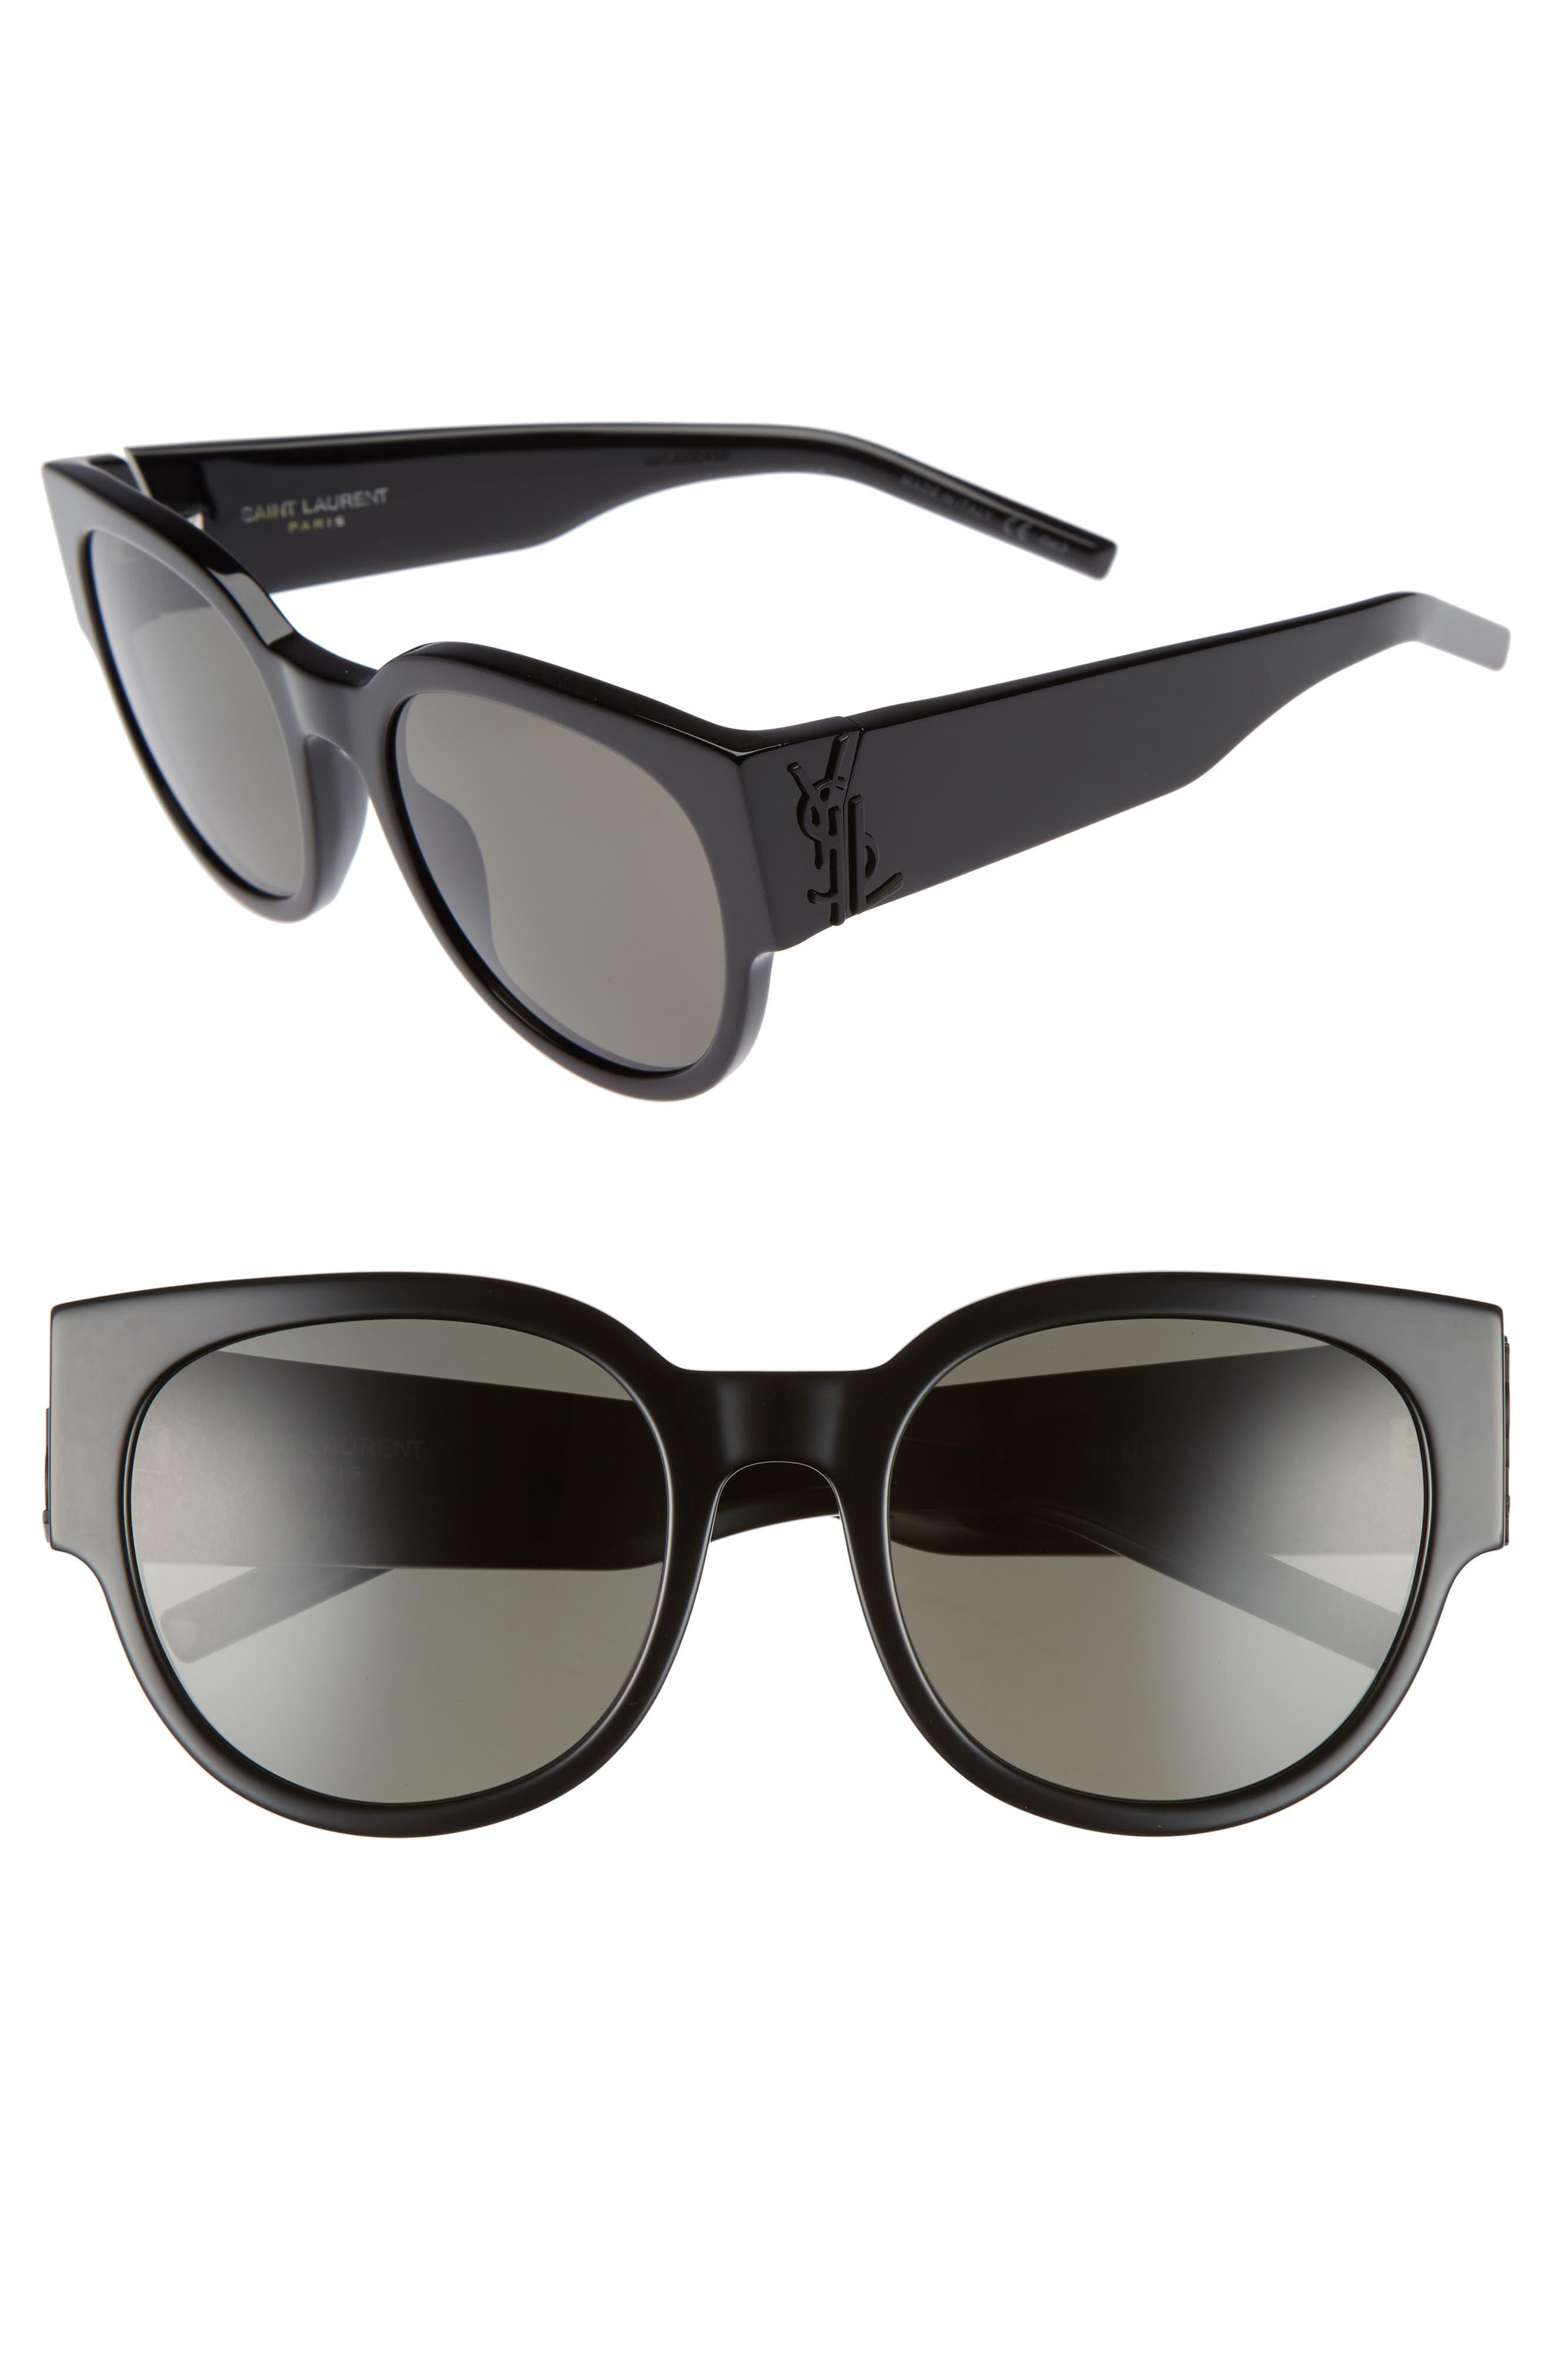 SL M19 54mm Cat Eye Sunglasses,                         Main,                         color, BLACK